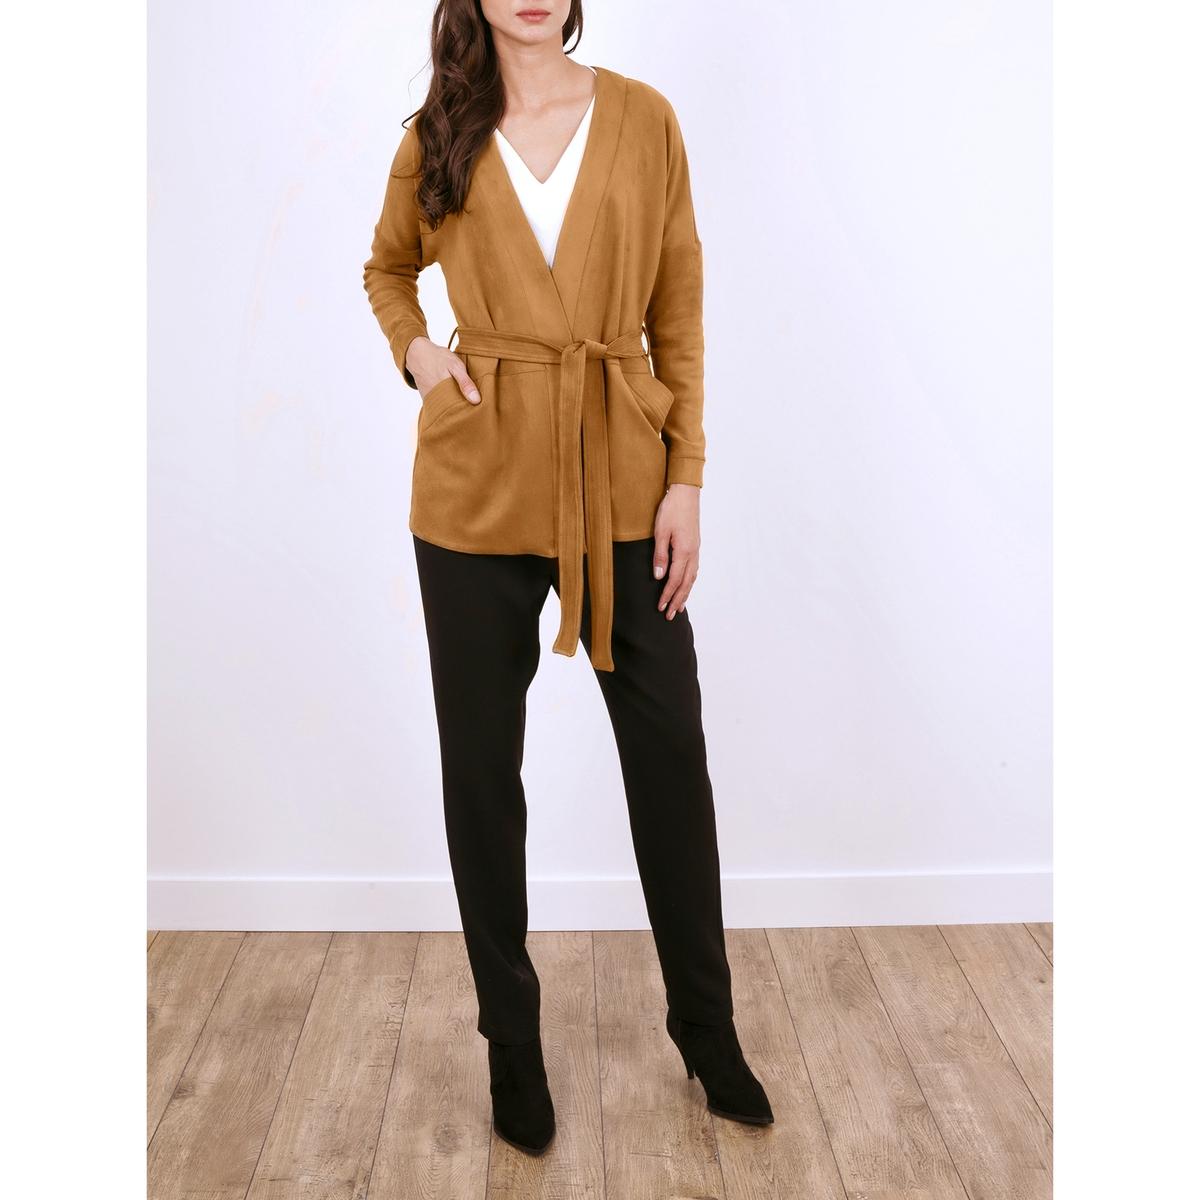 Жакет в стиле кимоно lenny b блузка